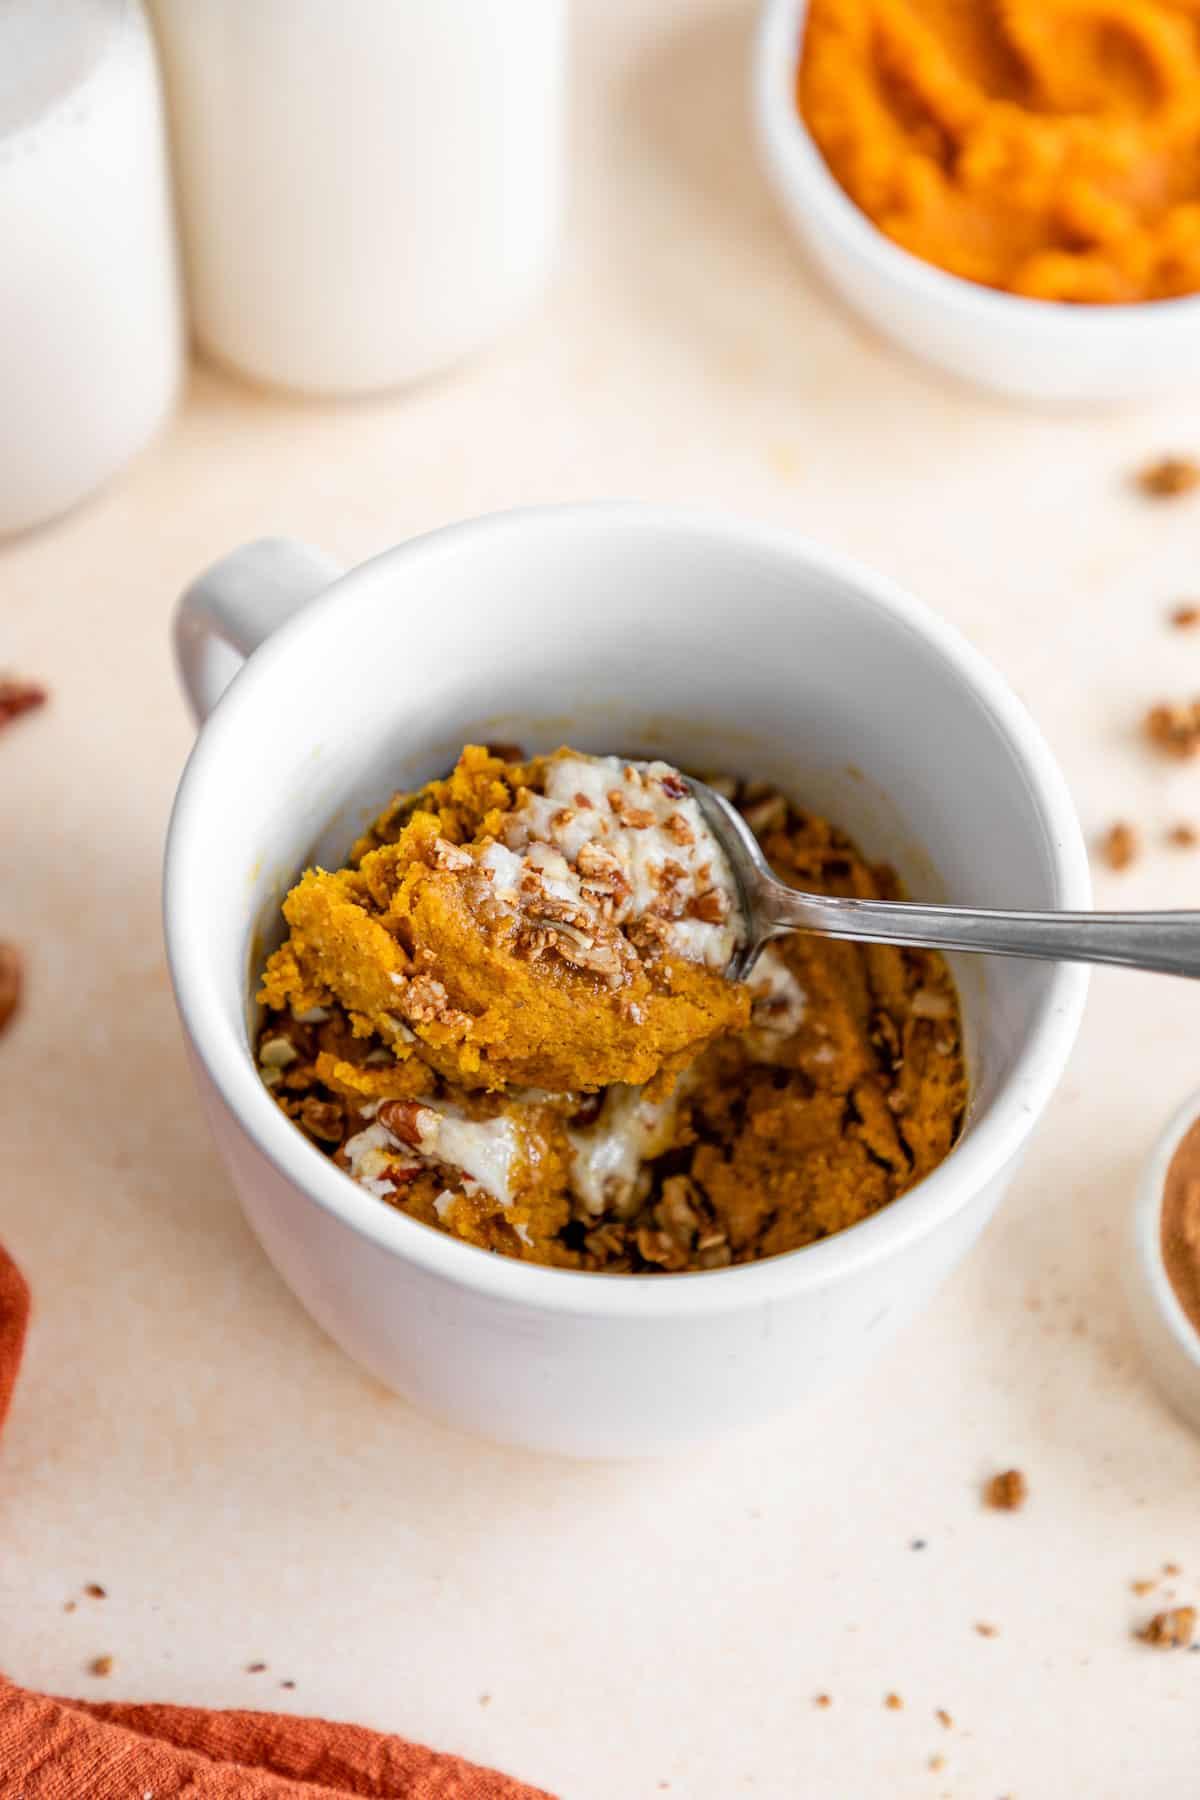 a spoon scooping a bite of vegan pumpkin mug cake out of a white mug